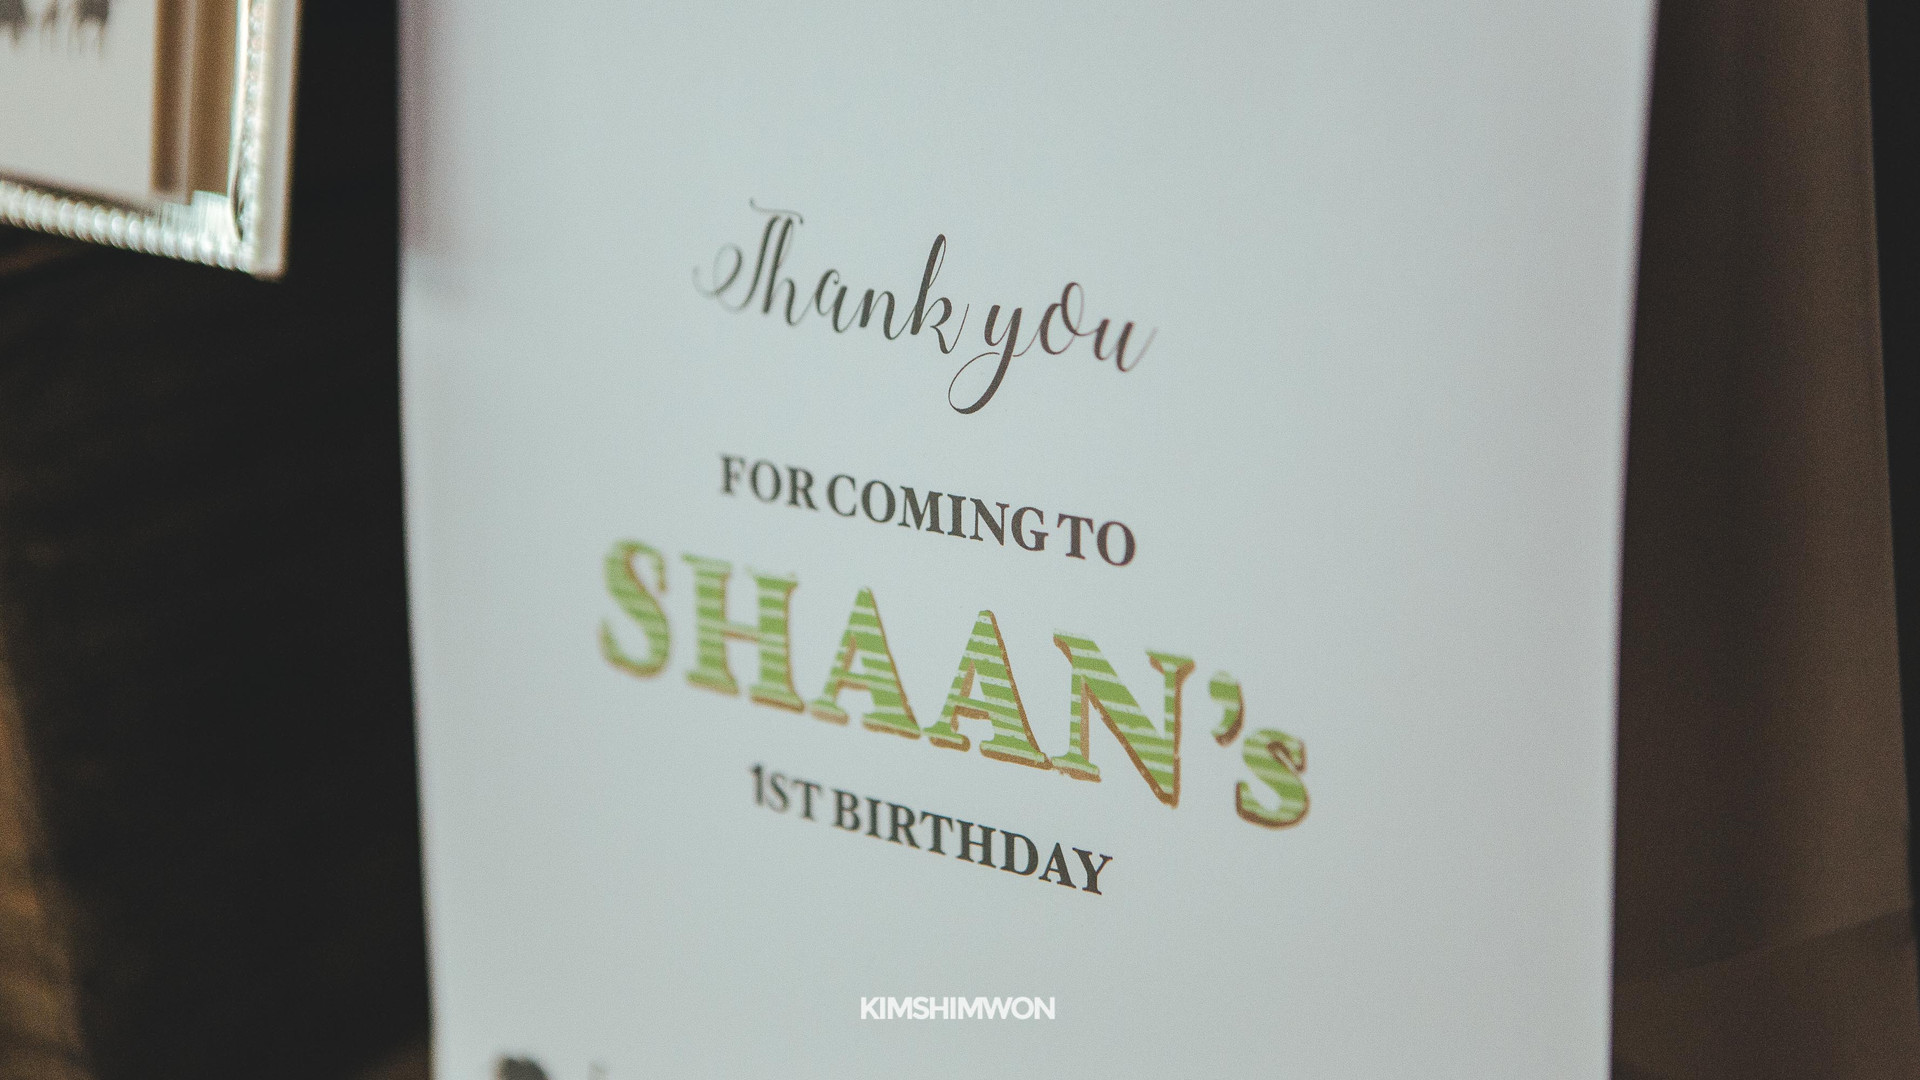 Shaan First Birthday 10.15.16-28.jpg